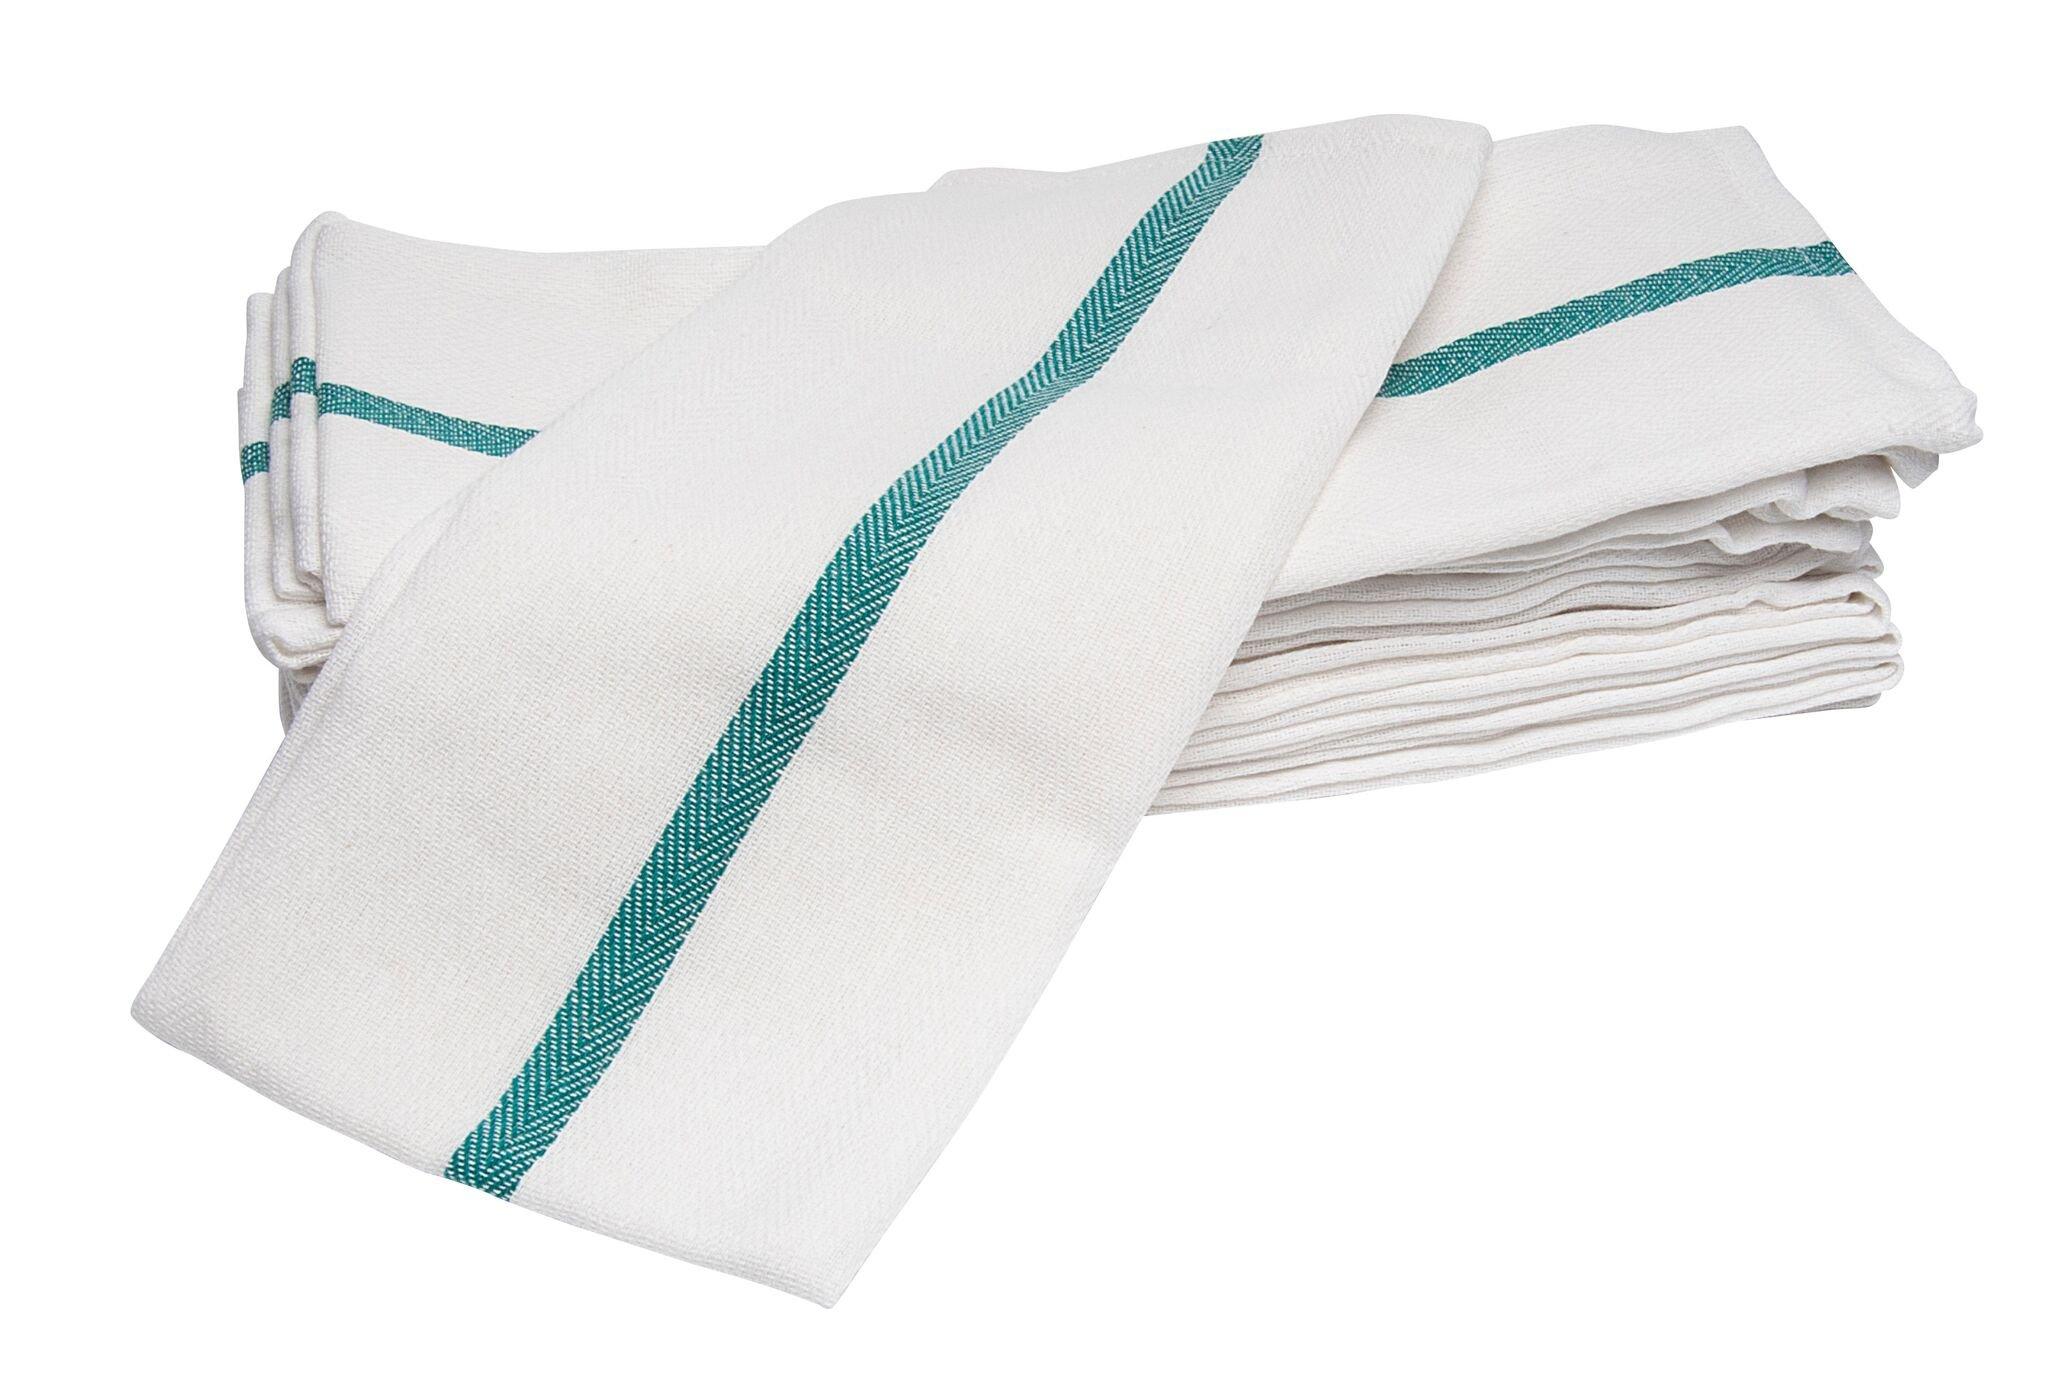 Diane DET005 Barber Towel, White by Diane